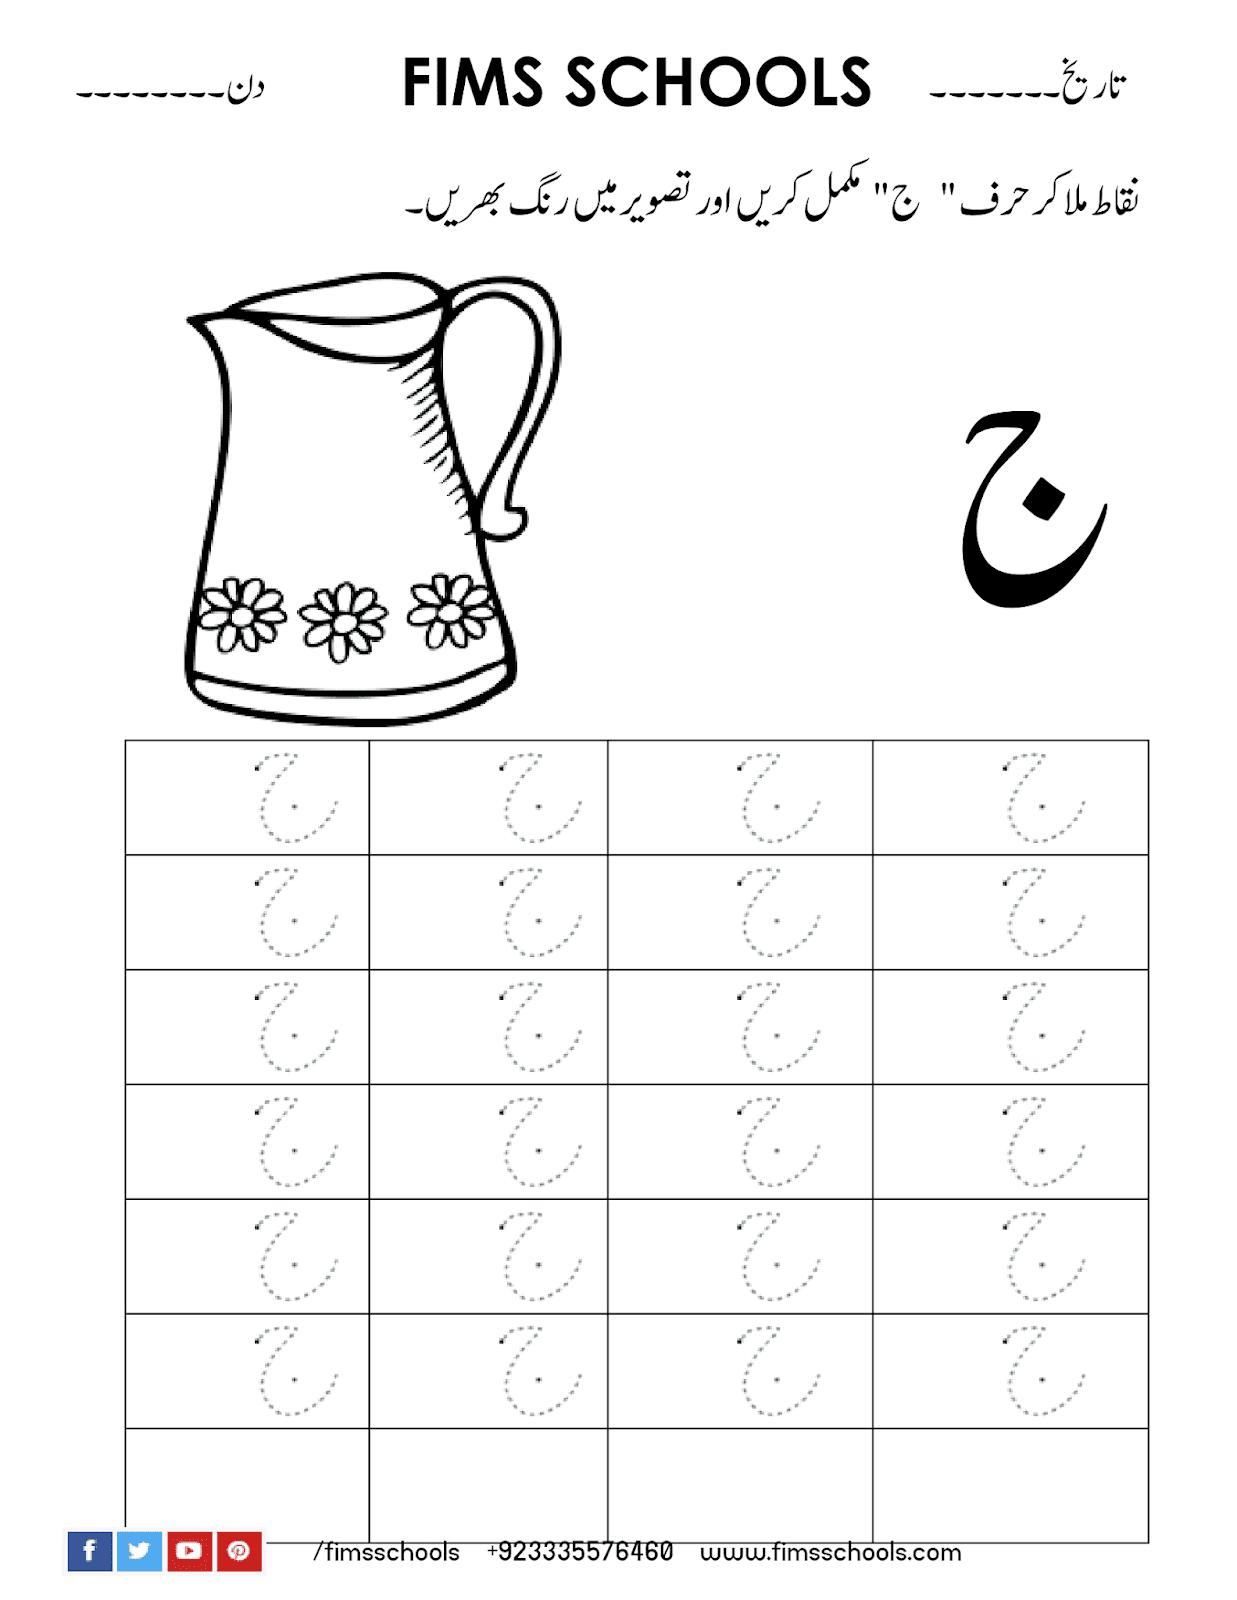 Urdu Alphabets Tracing Work Sheets In 2020 | Alphabet